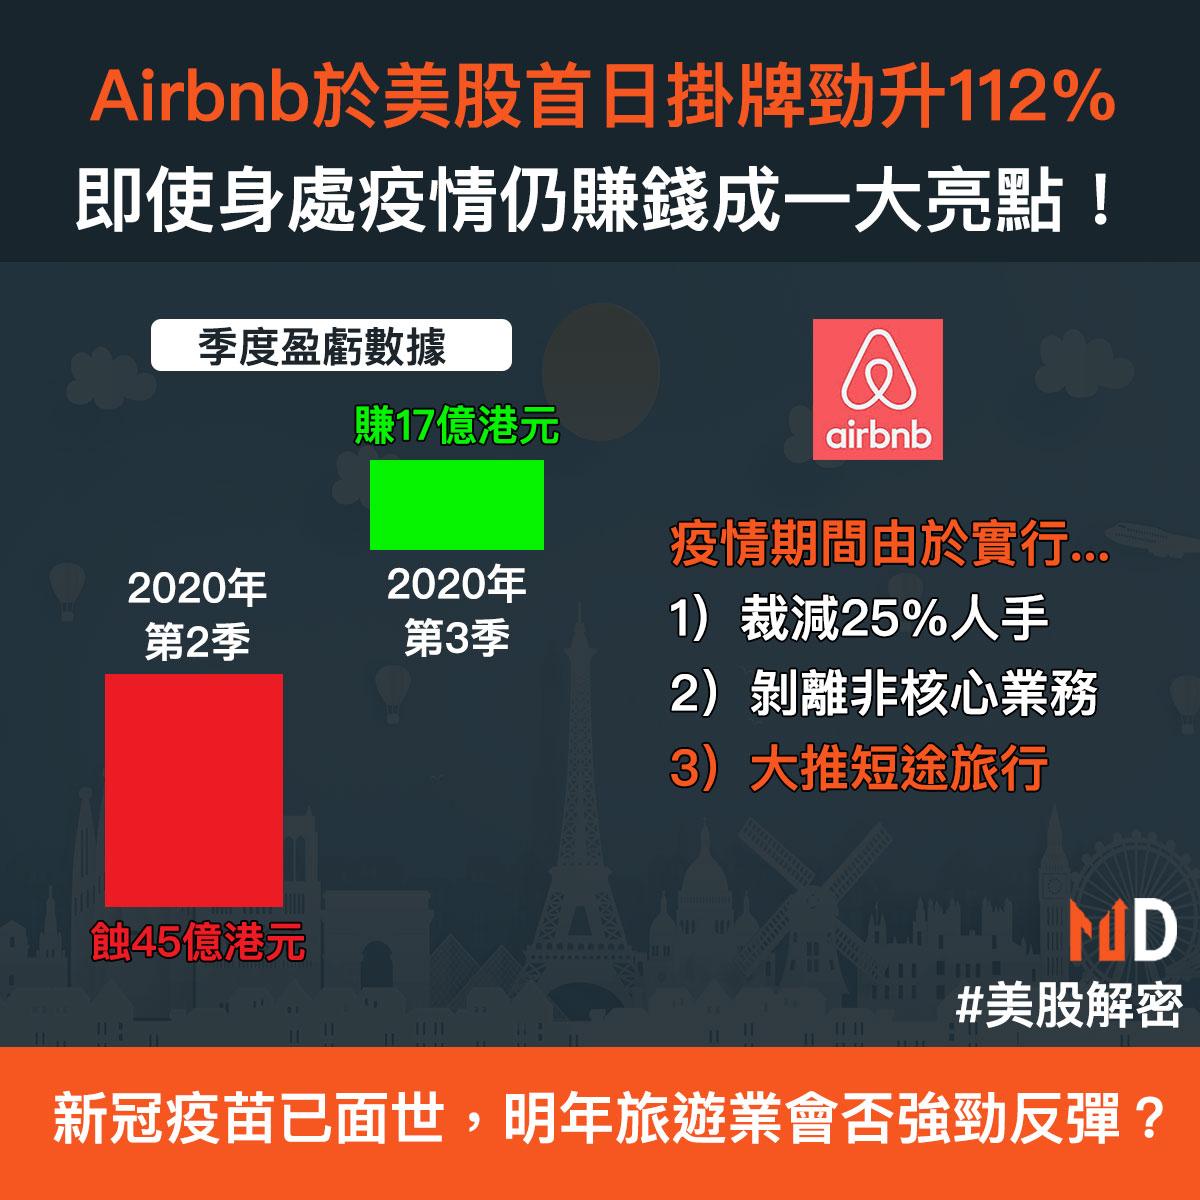 美股airbnb